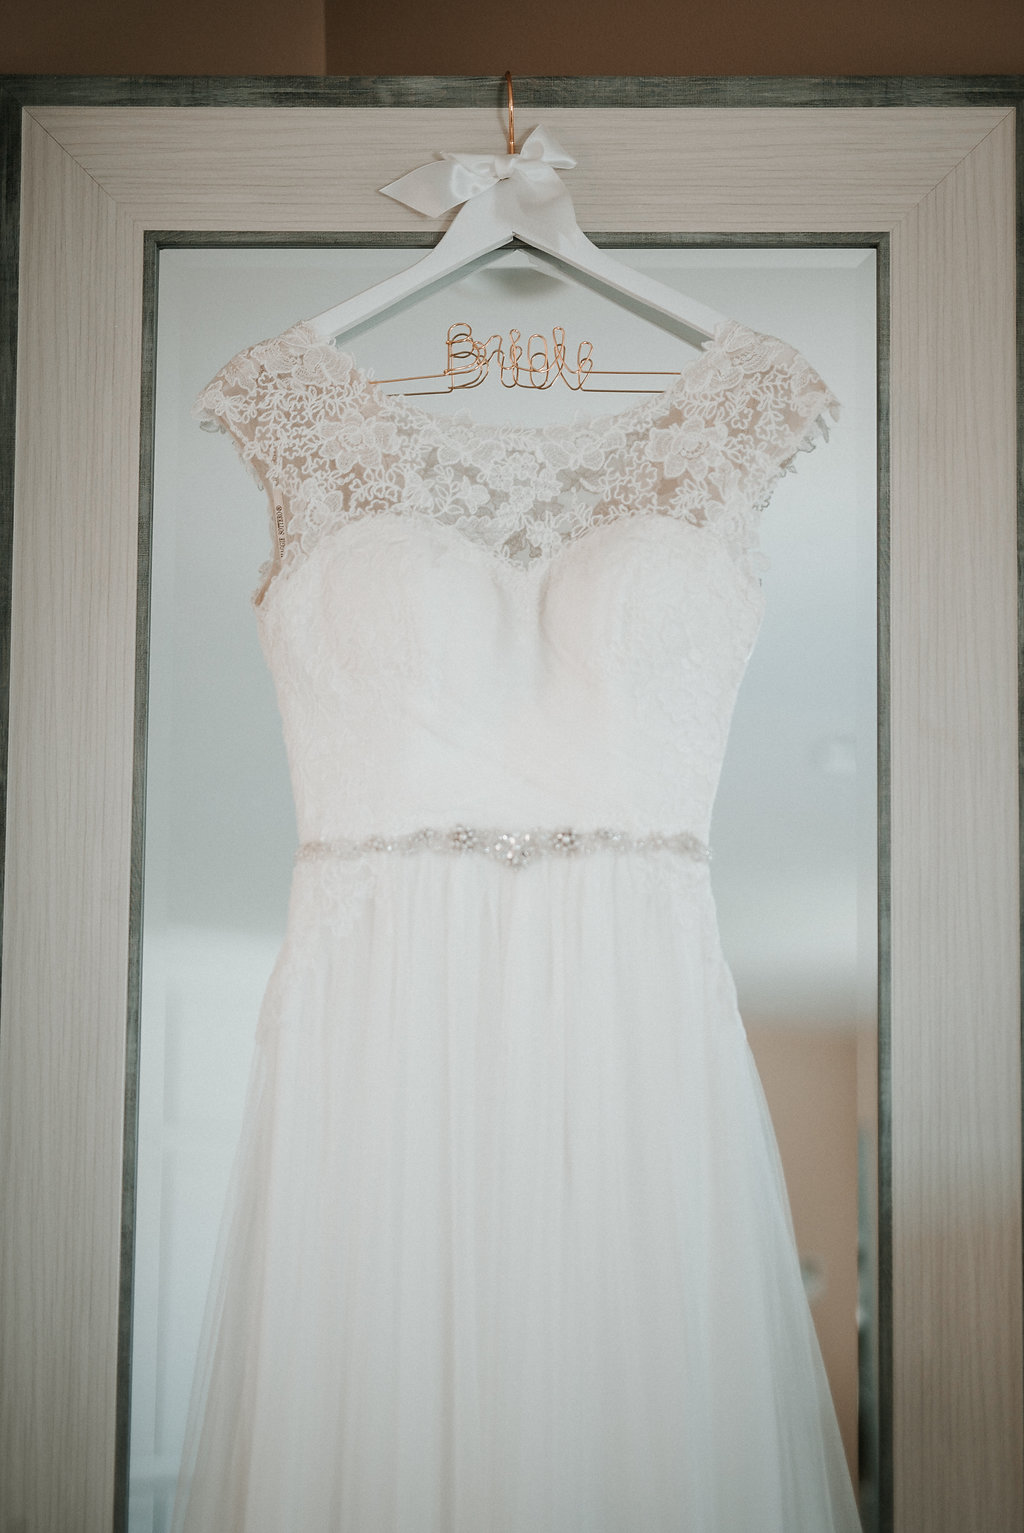 Wedding Dress Detail Shot at Crystal Point Yacht Club